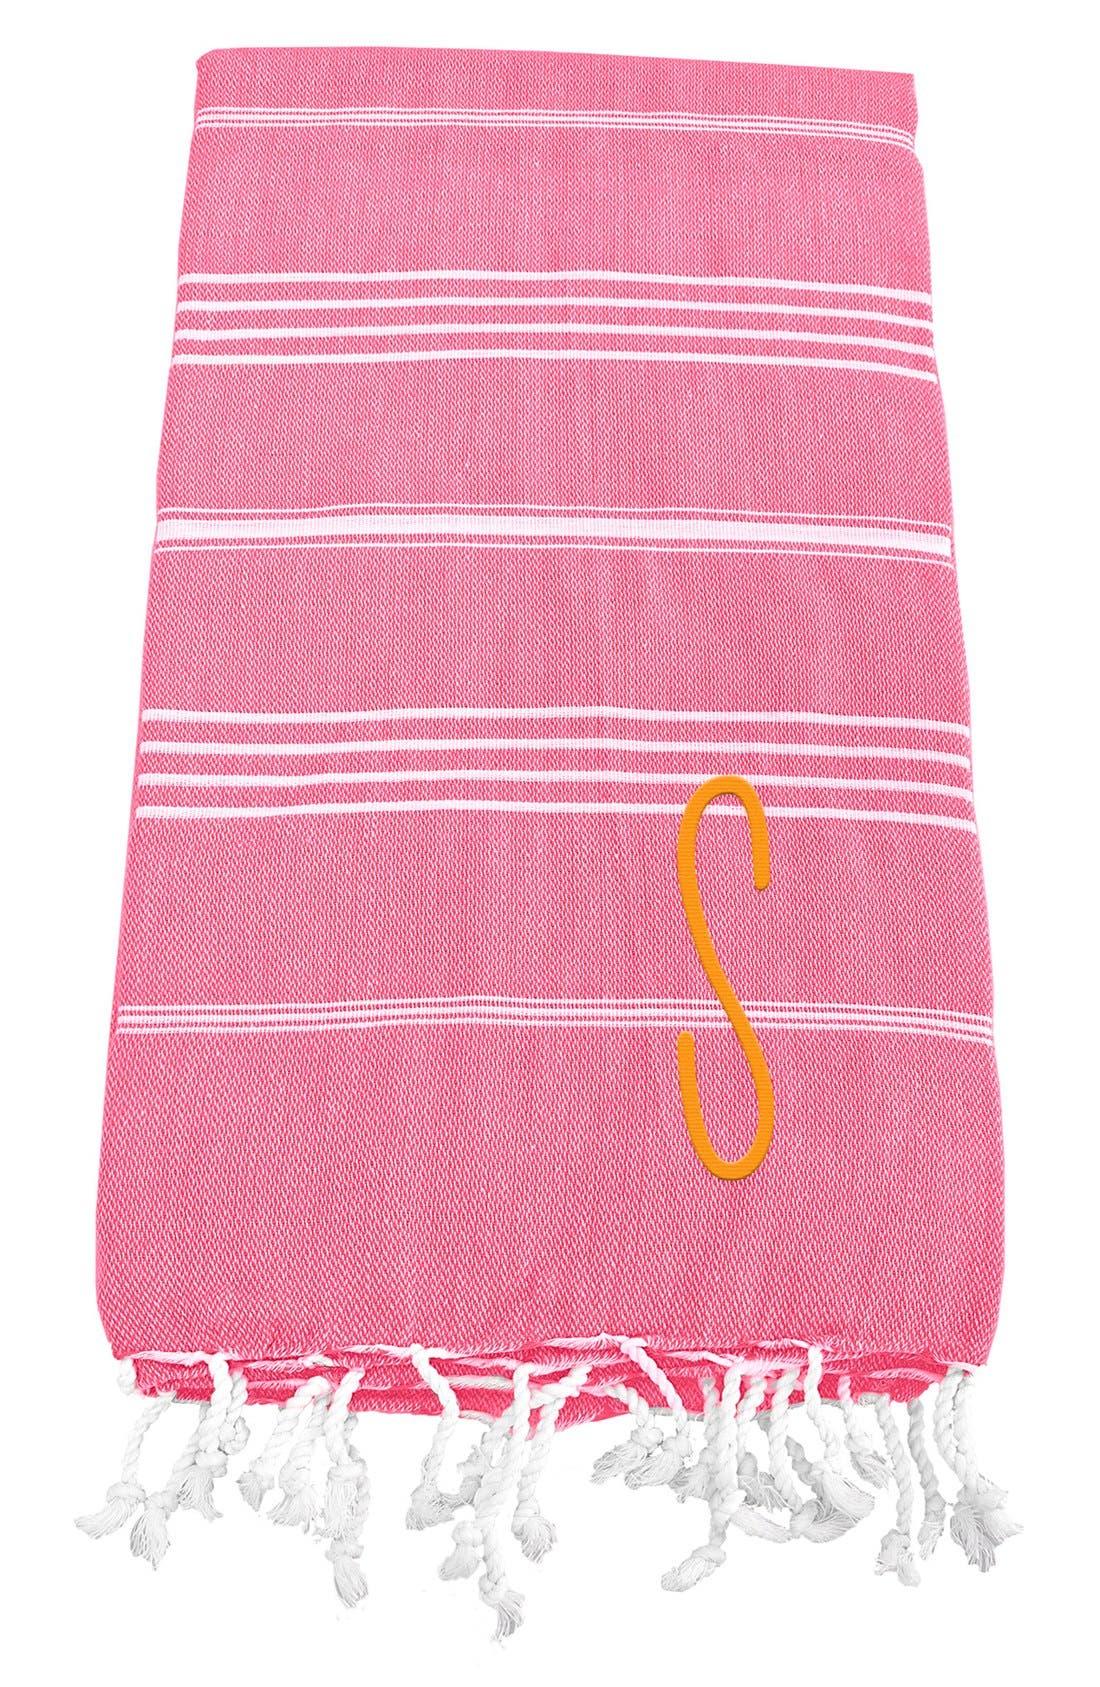 Monogram Turkish Cotton Towel,                             Main thumbnail 155, color,